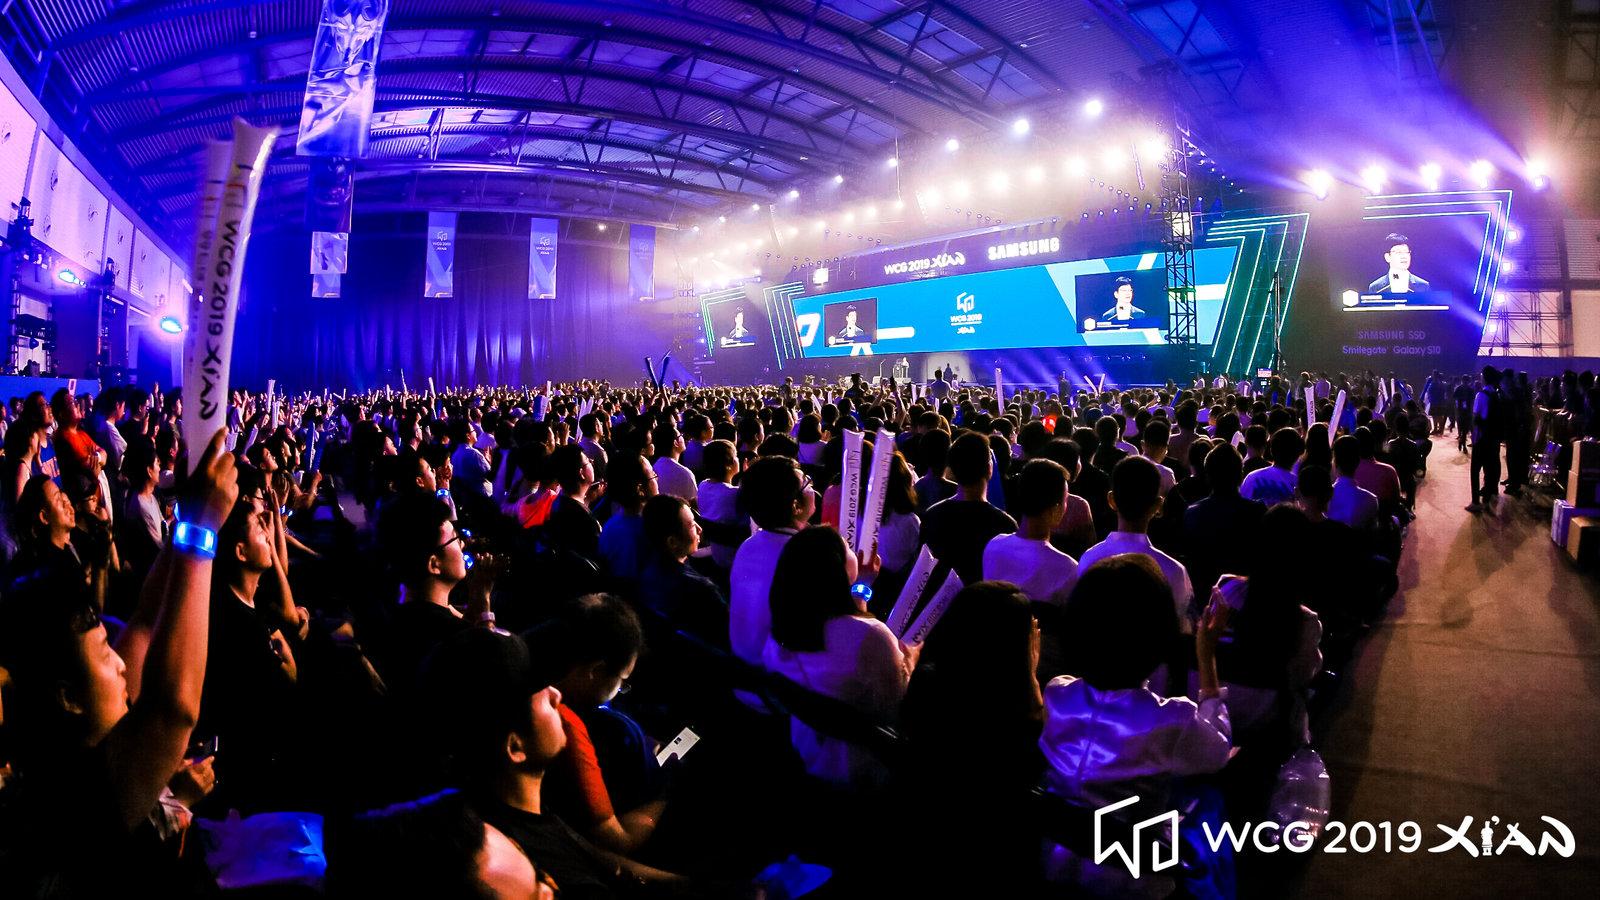 WCG 2019 시안의 개막식을 찾은 관람객들.